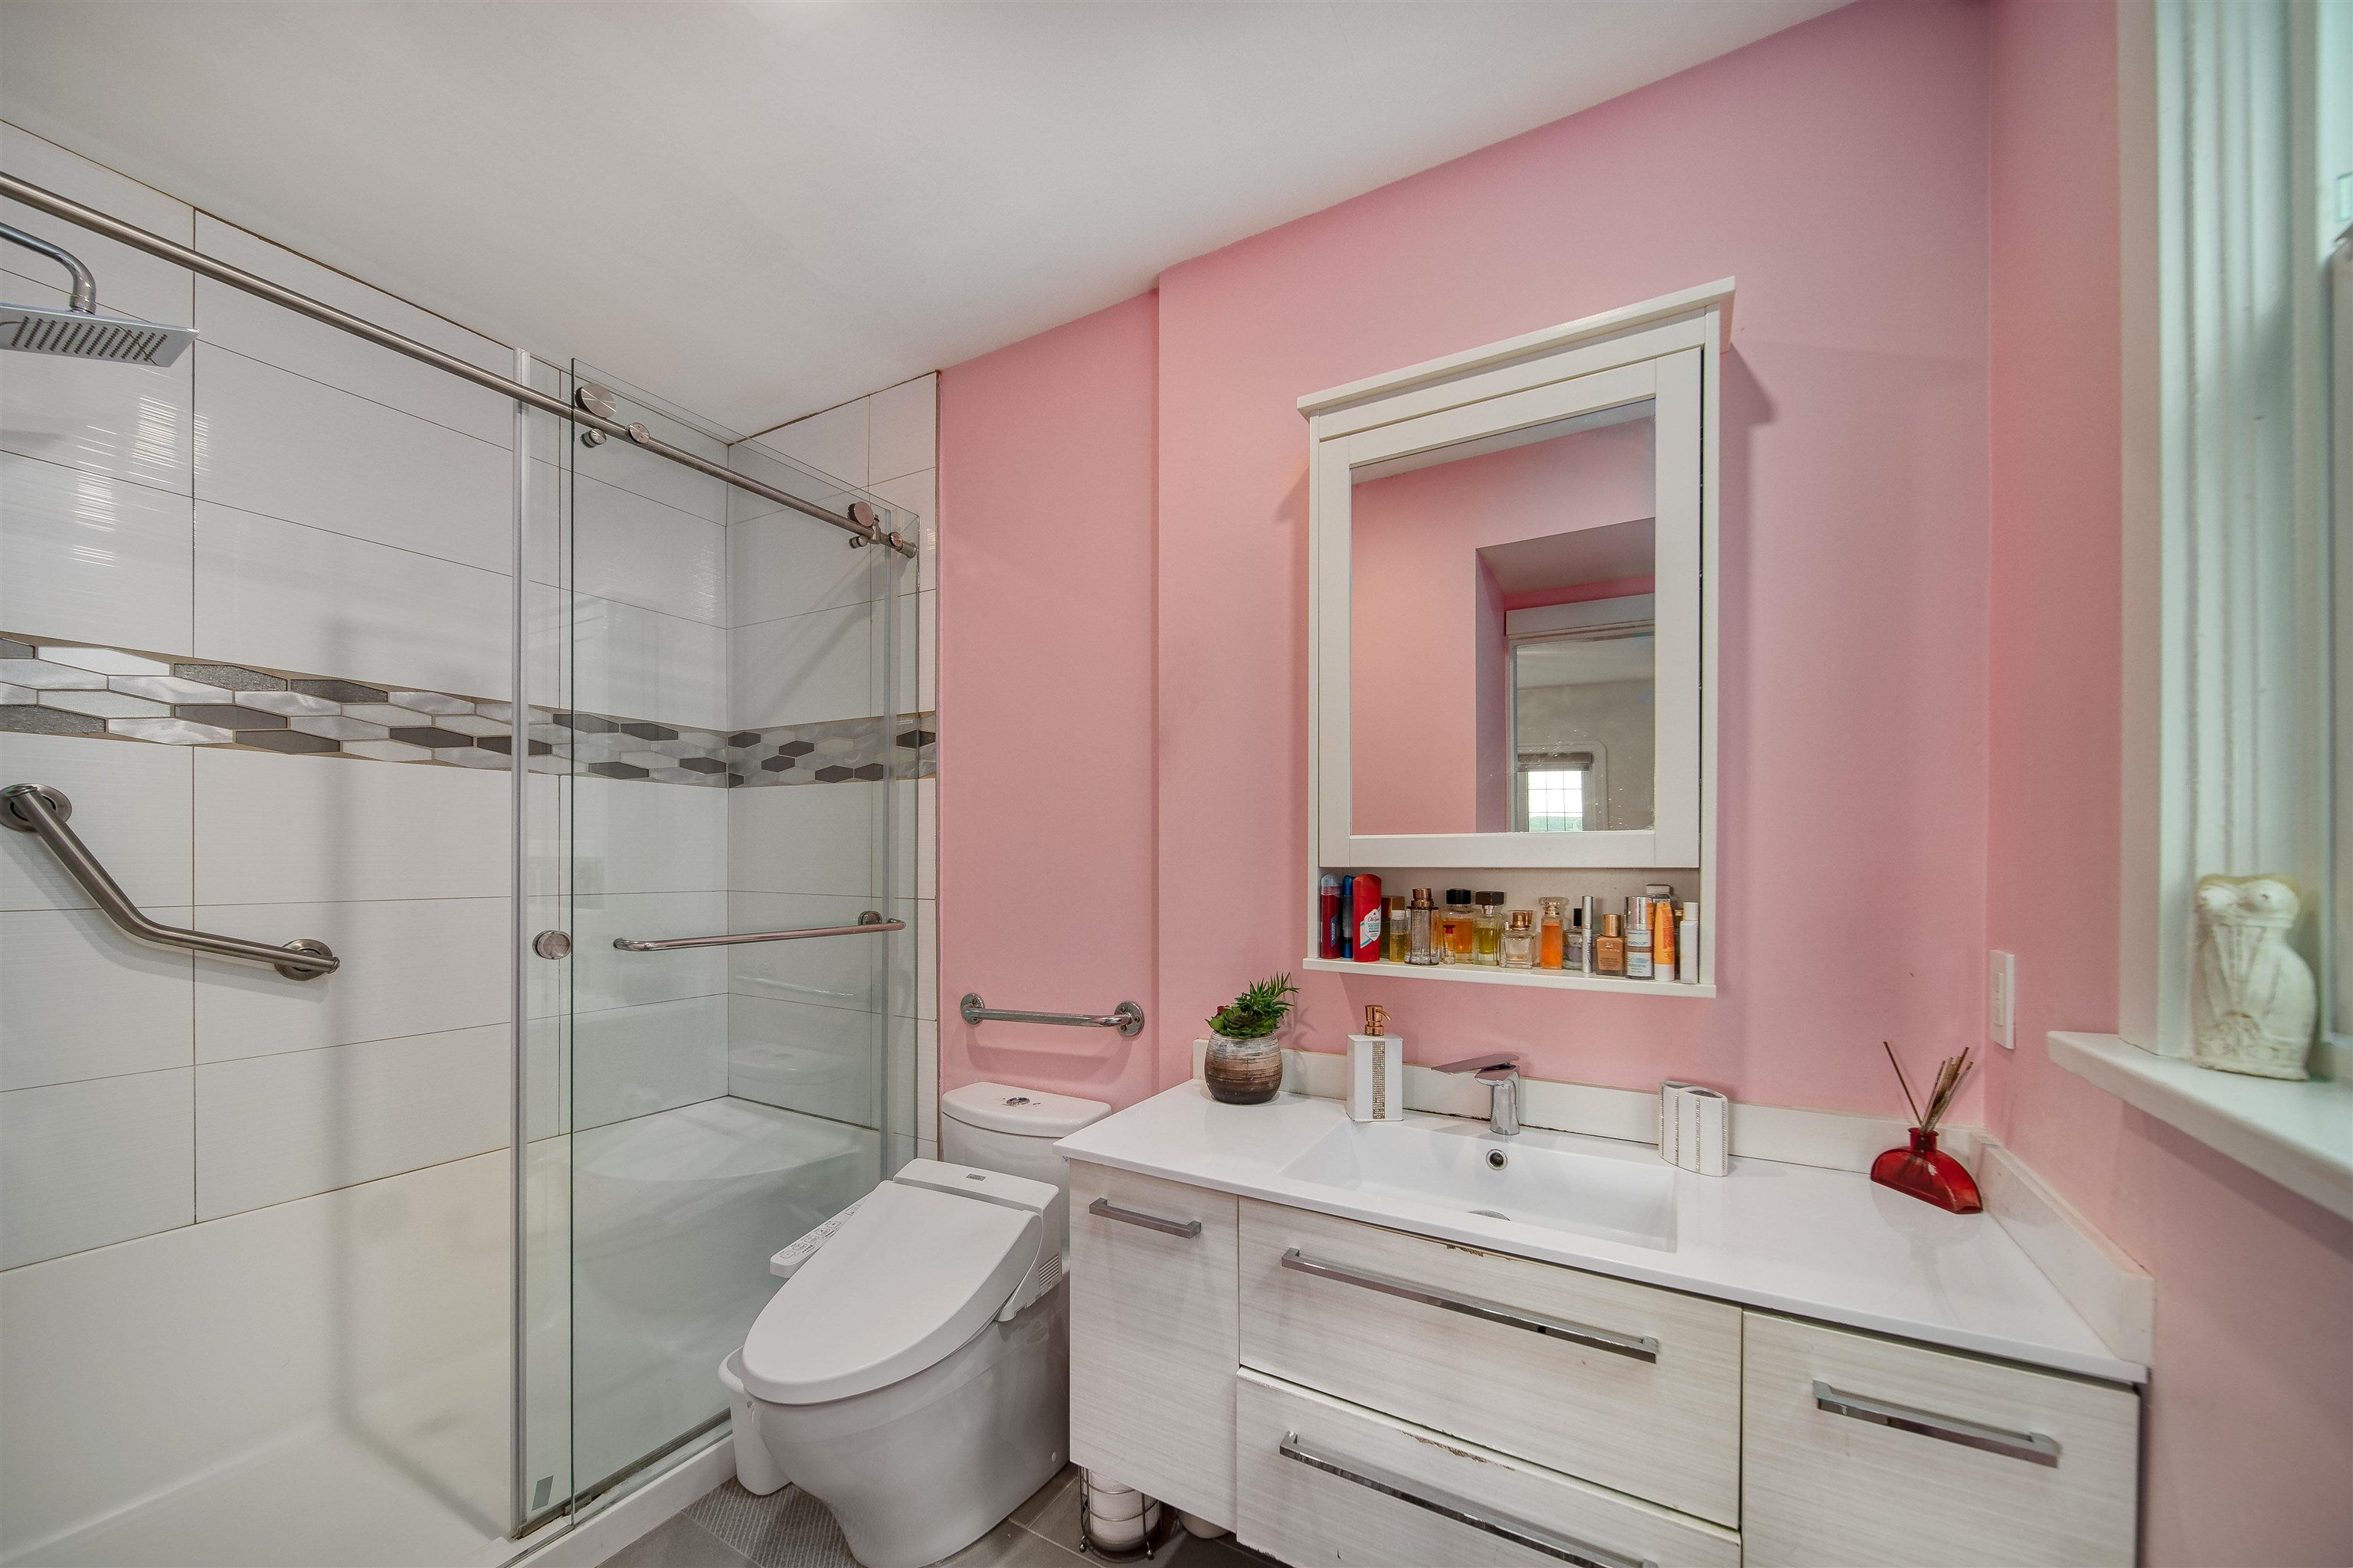 1357 FULTON AVENUE - Ambleside House/Single Family for sale, 6 Bedrooms (R2617731) - #24